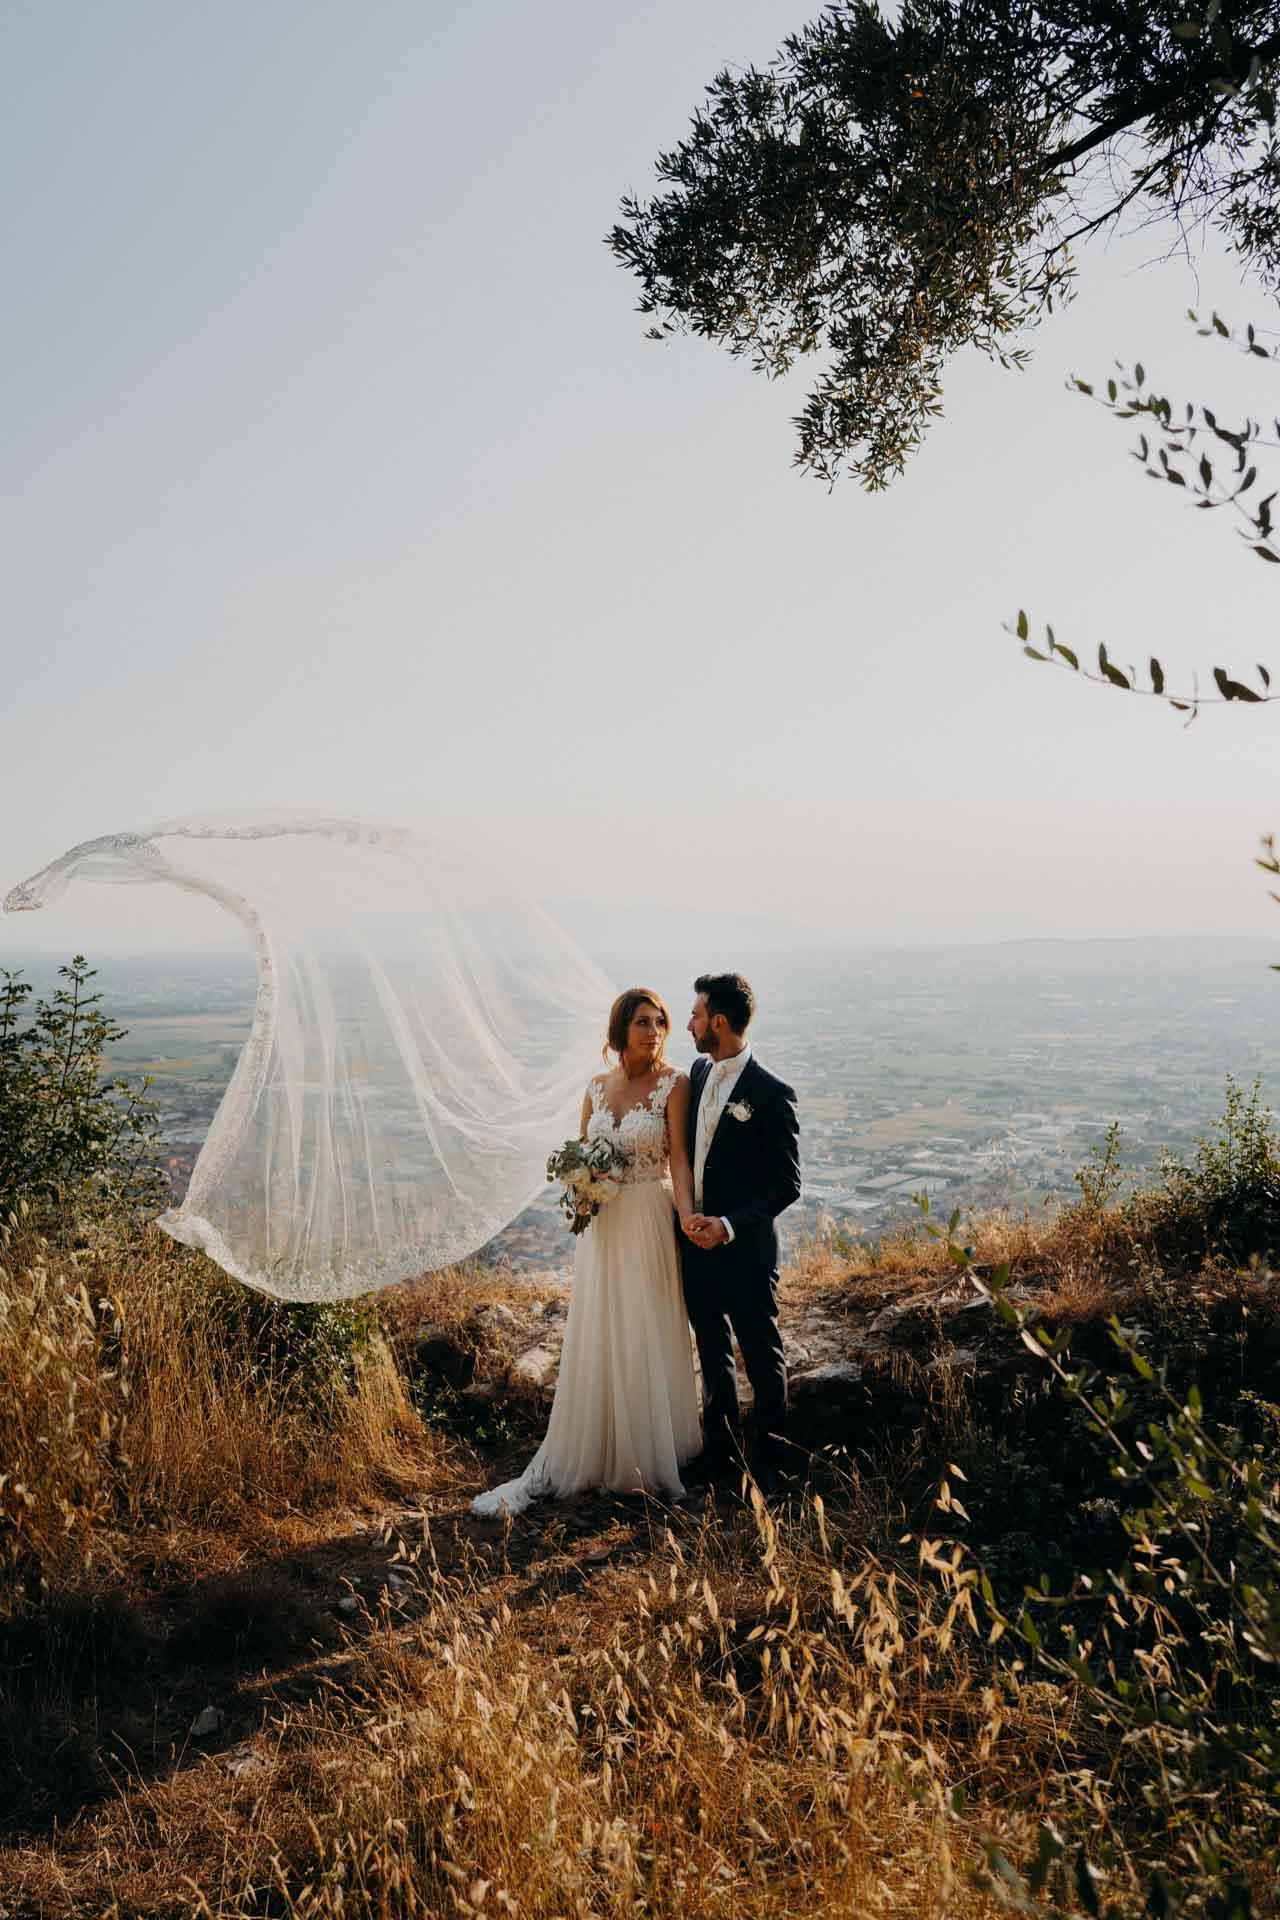 fotografo_matrimonio_toscana_poggio_tondo_84